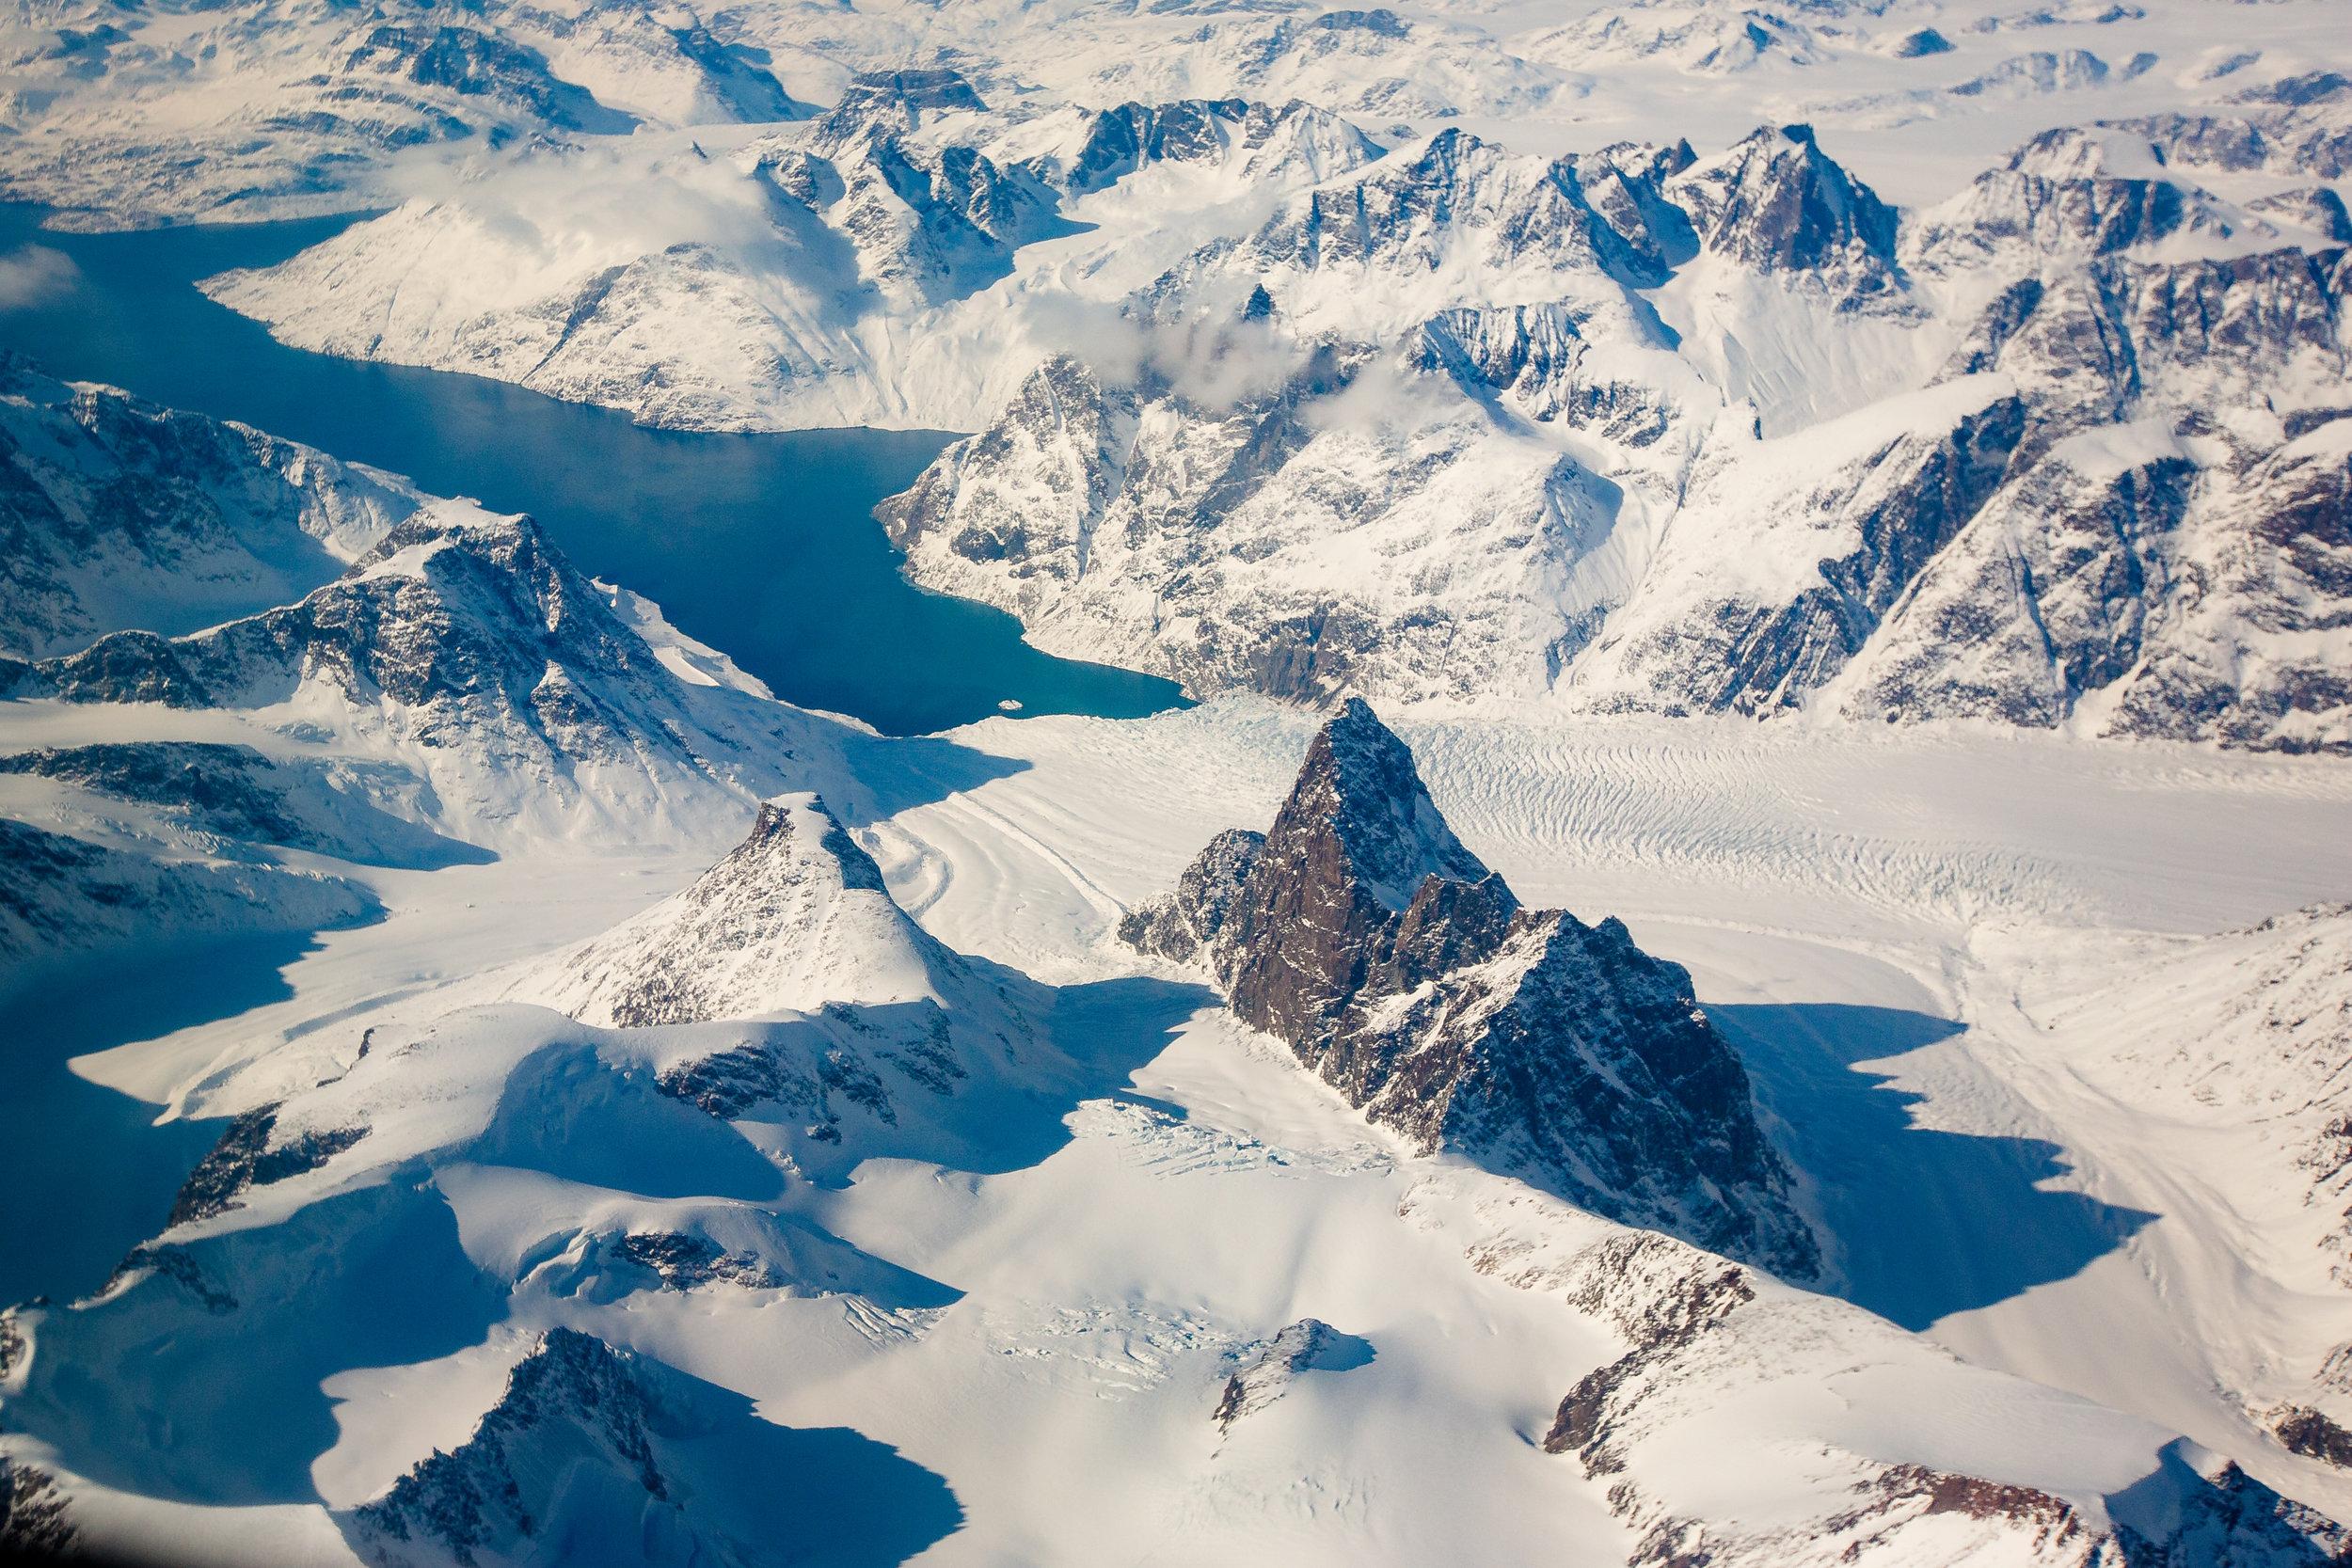 Powderbird-Greenland-Gallery-Images3.jpg